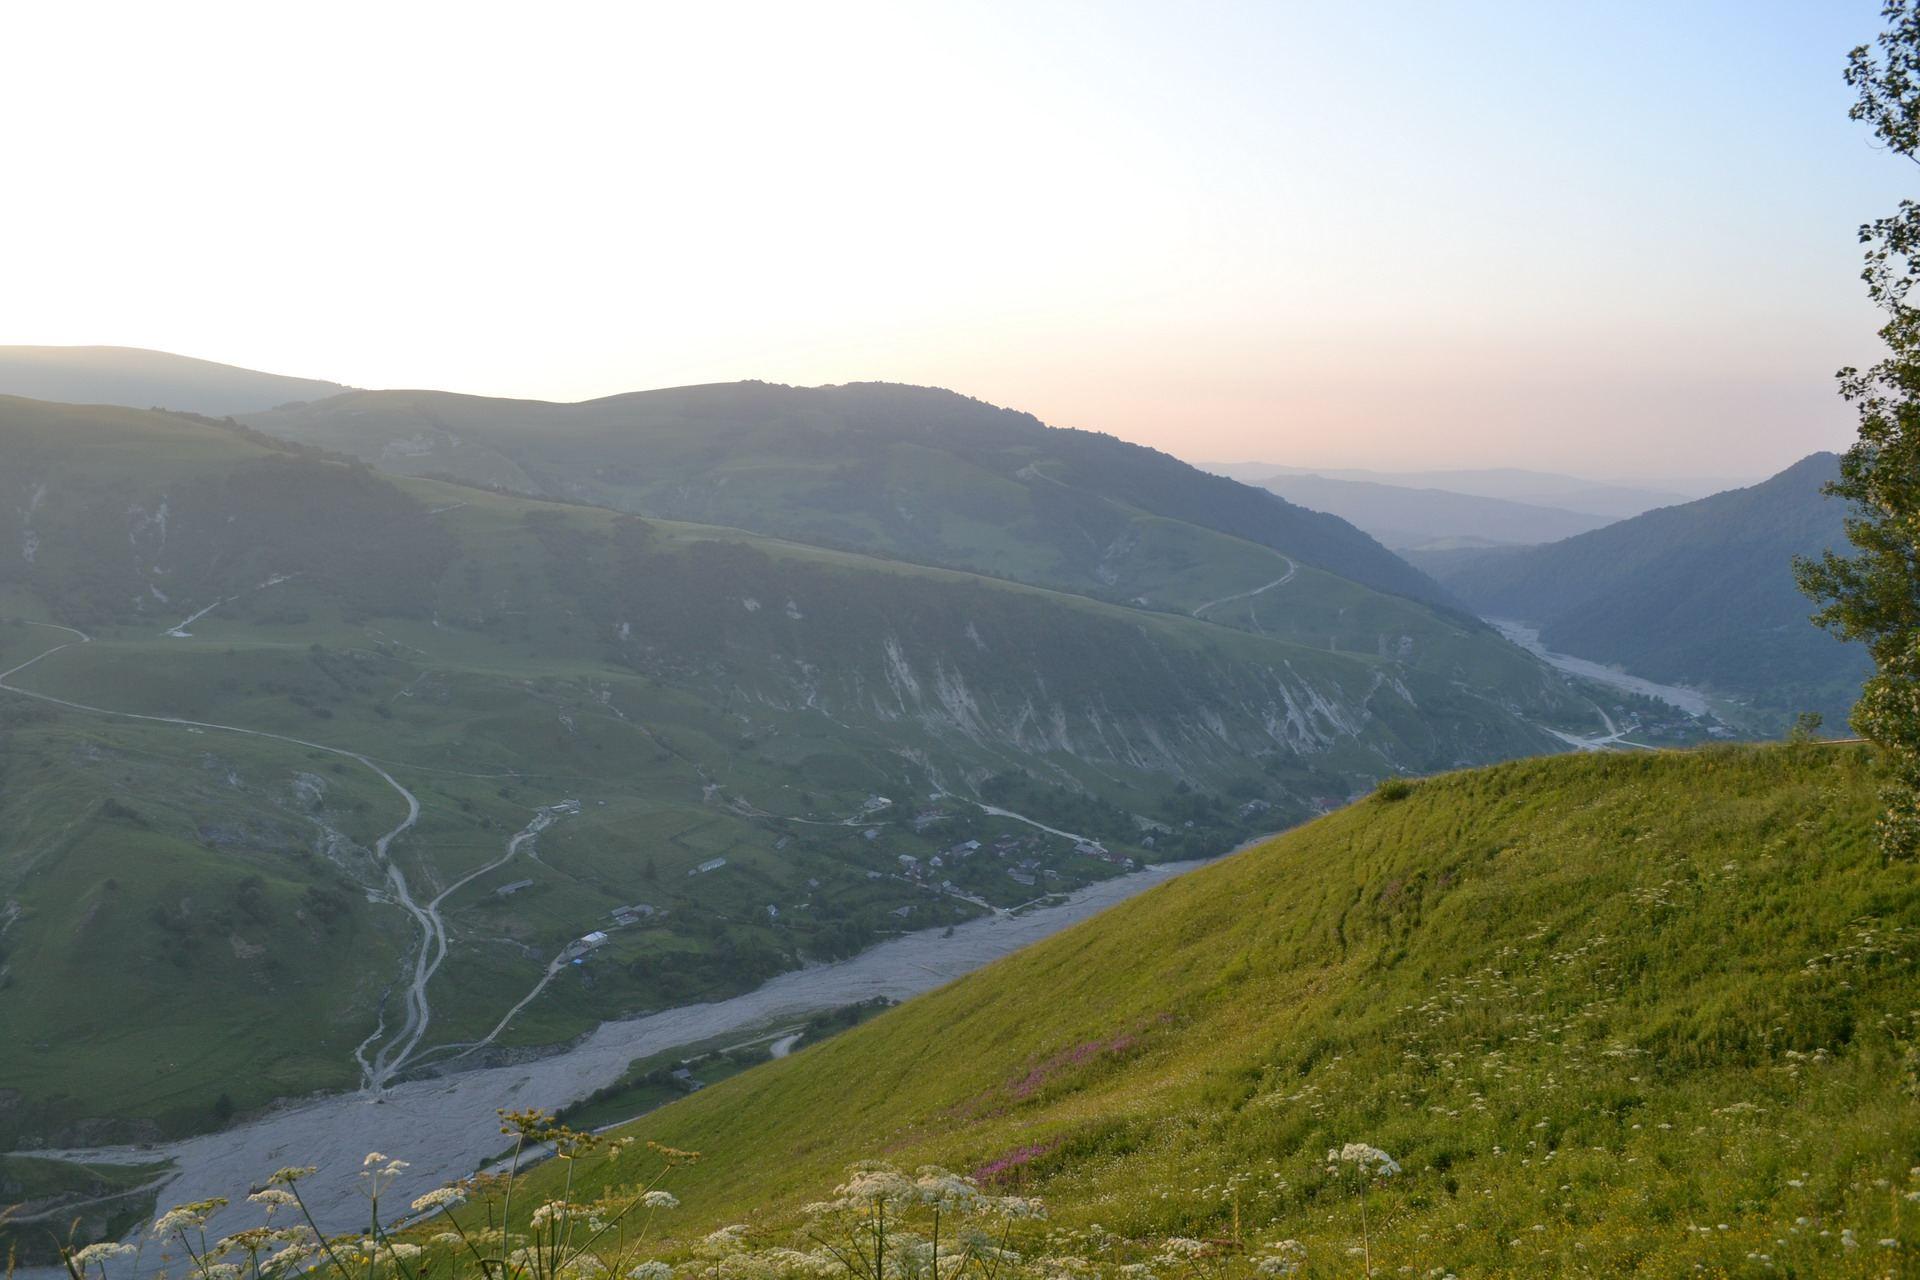 чечня, горы кавказа, река, ущелье